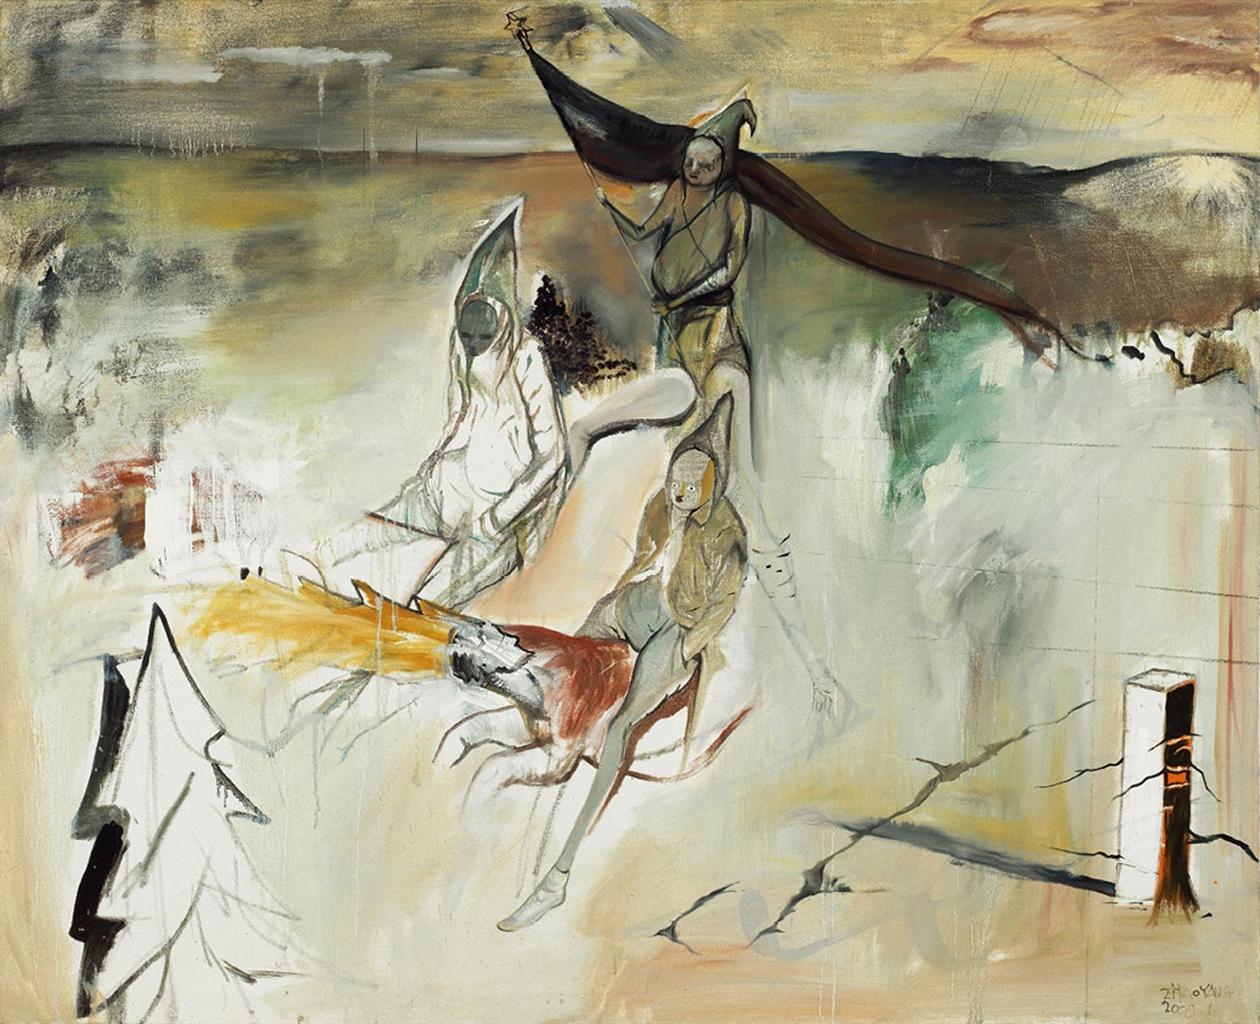 Zhao Yang-Darkness-2009